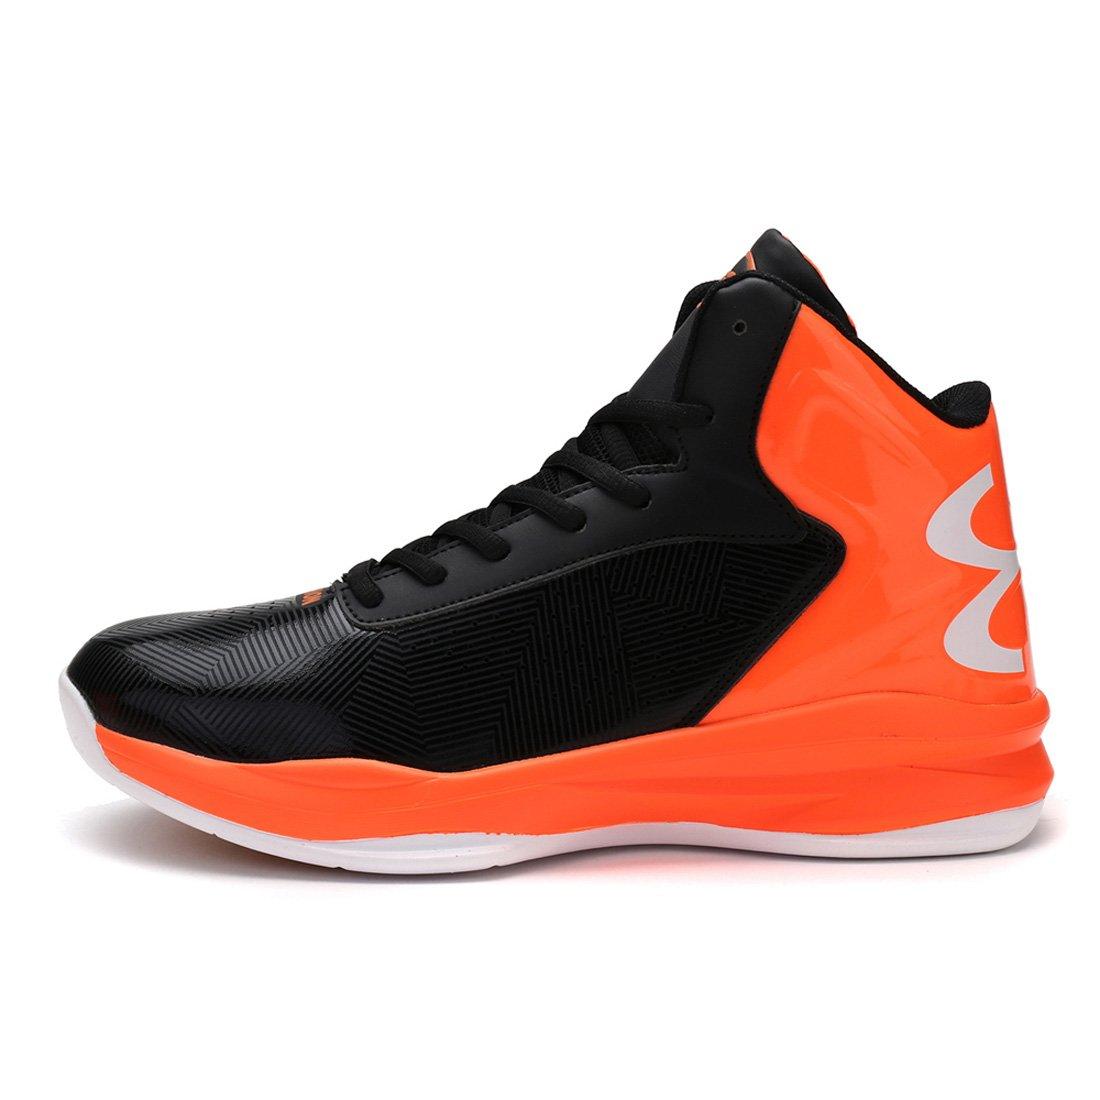 DANDANJIE Mens Basketball Schuhe Hallo Top Ankle Trainer Stiefel Stiefel Stiefel Laufschuhe Sportschuhe Größe 39-46 B07DPM9V4P Kletterschuhe Tadellos 987e7f